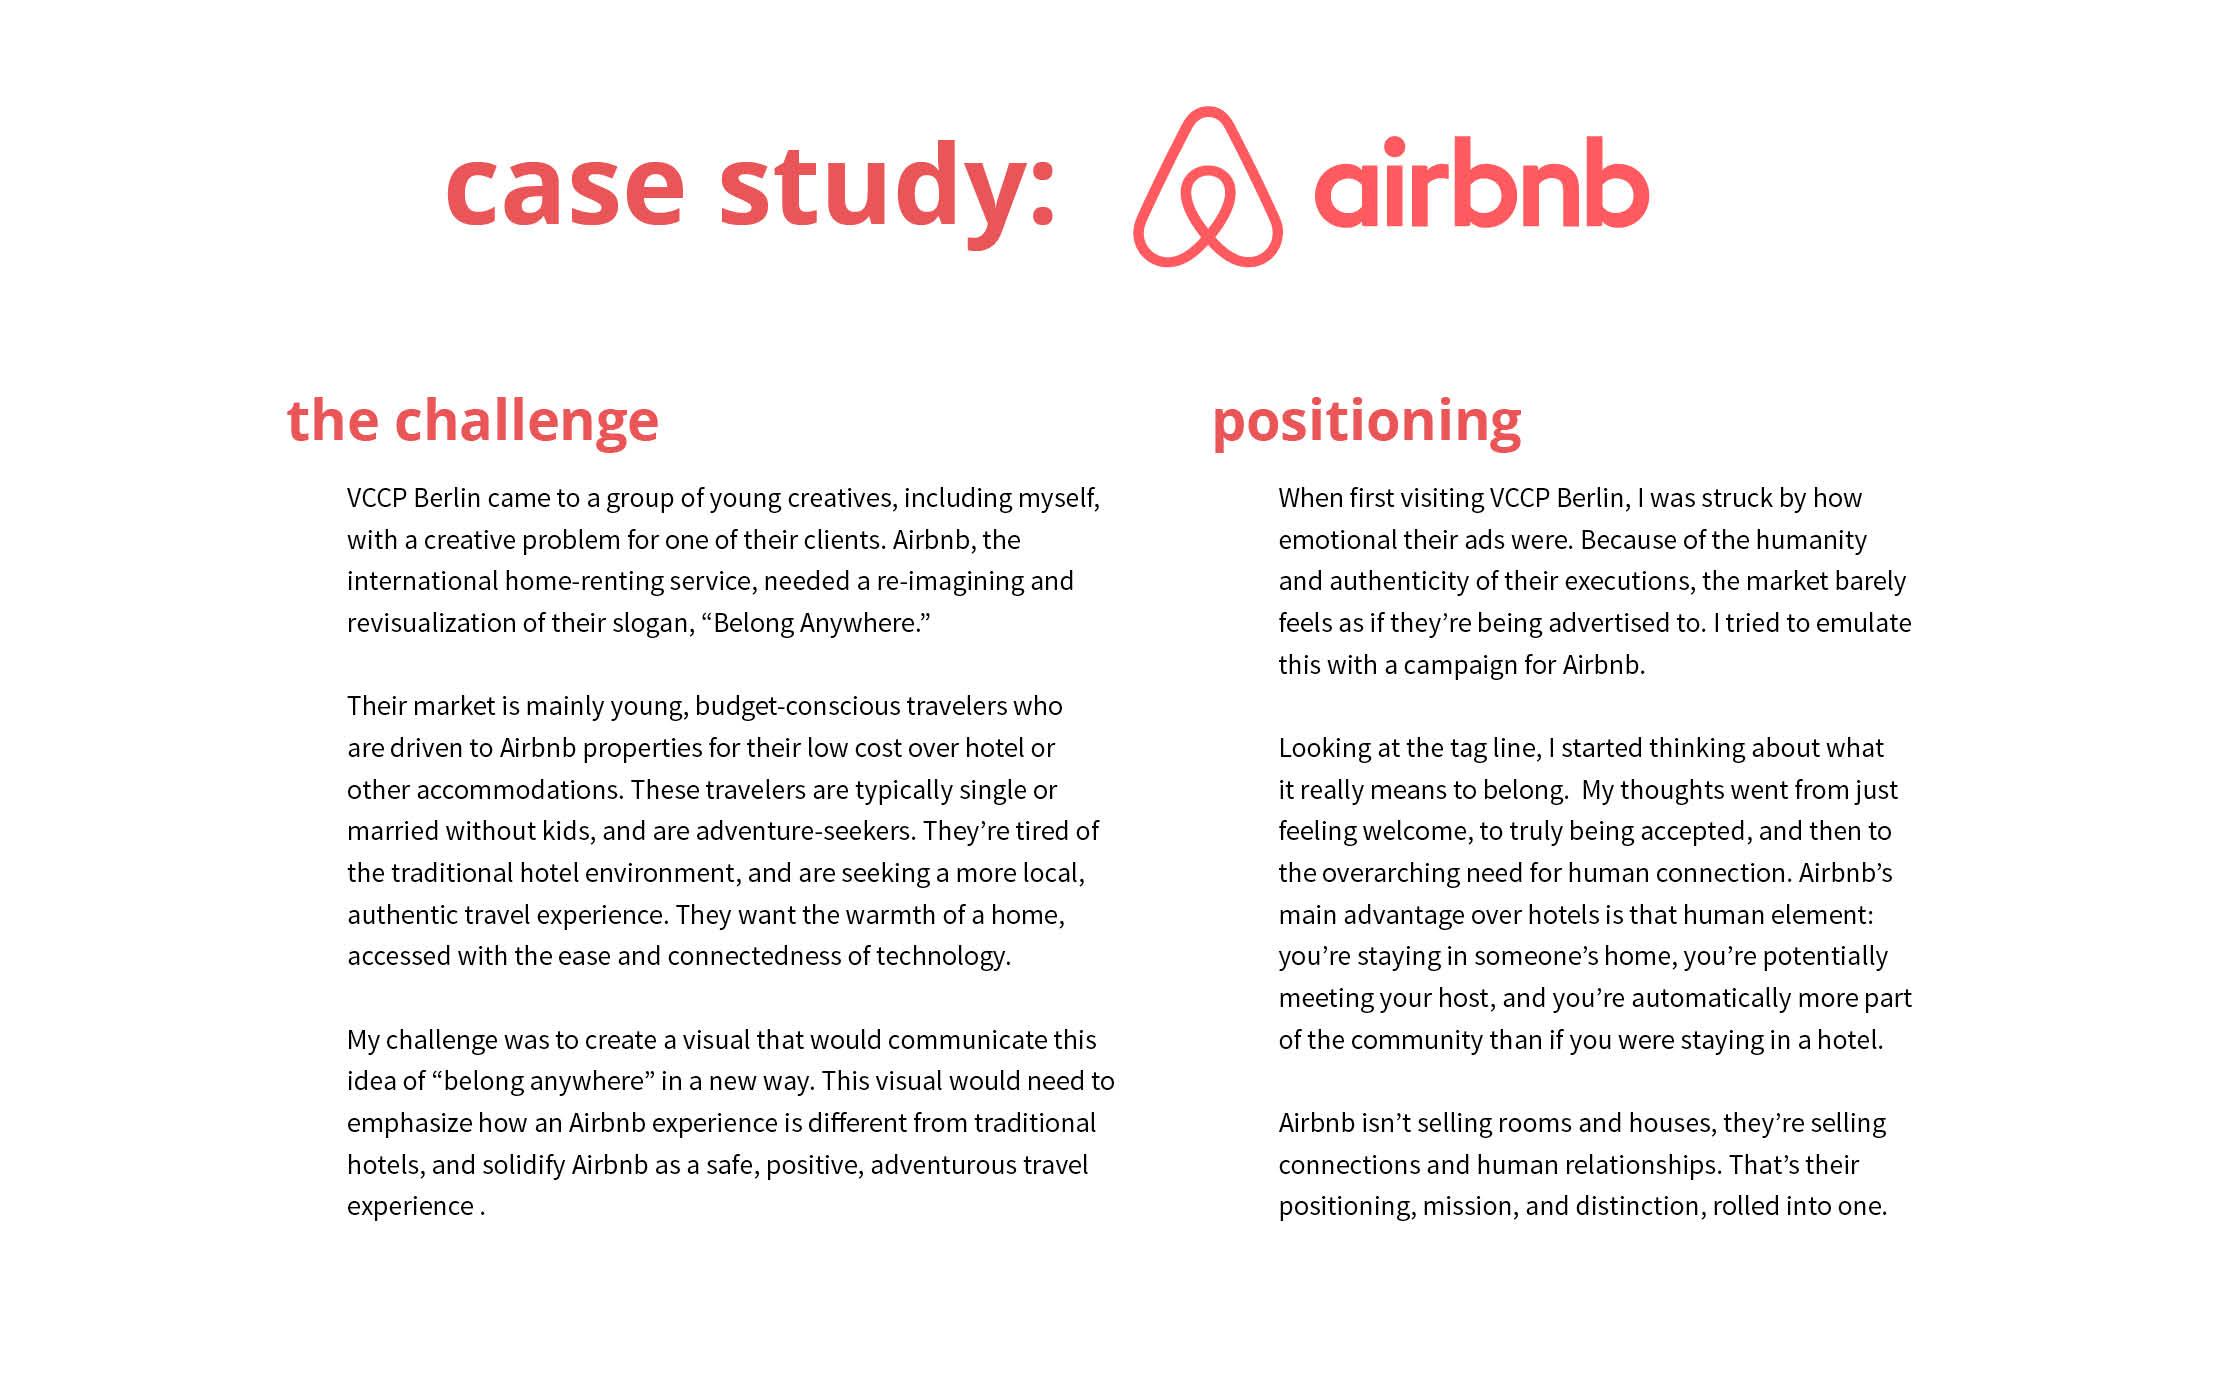 airbnb case study.jpg